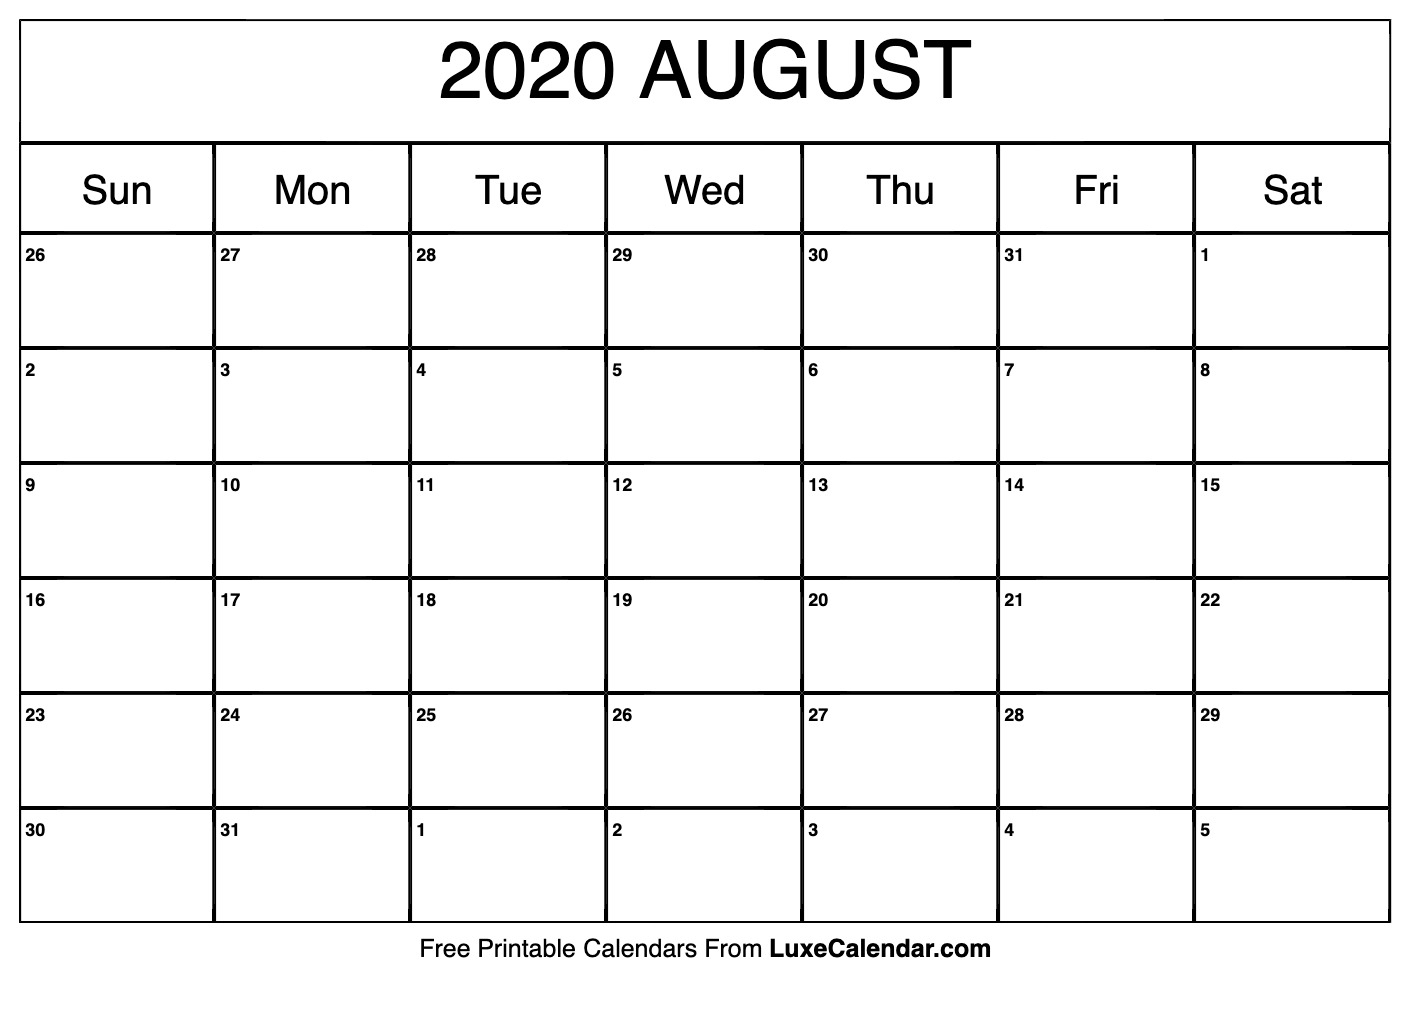 Blank August 2020 Calendar Printable - Luxe Calendar